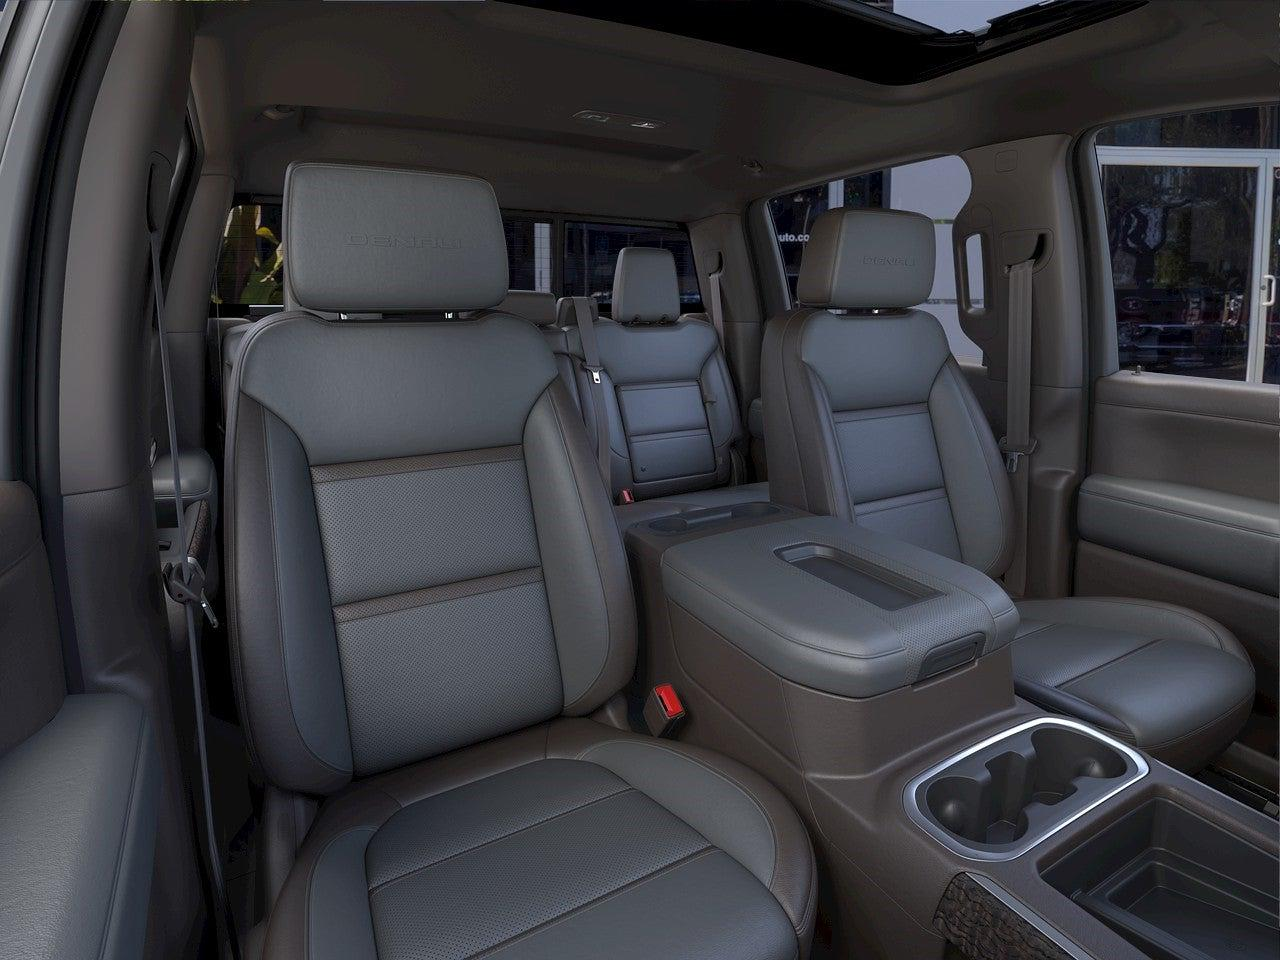 2021 GMC Sierra 1500 Crew Cab 4x4, Pickup #T21362 - photo 14